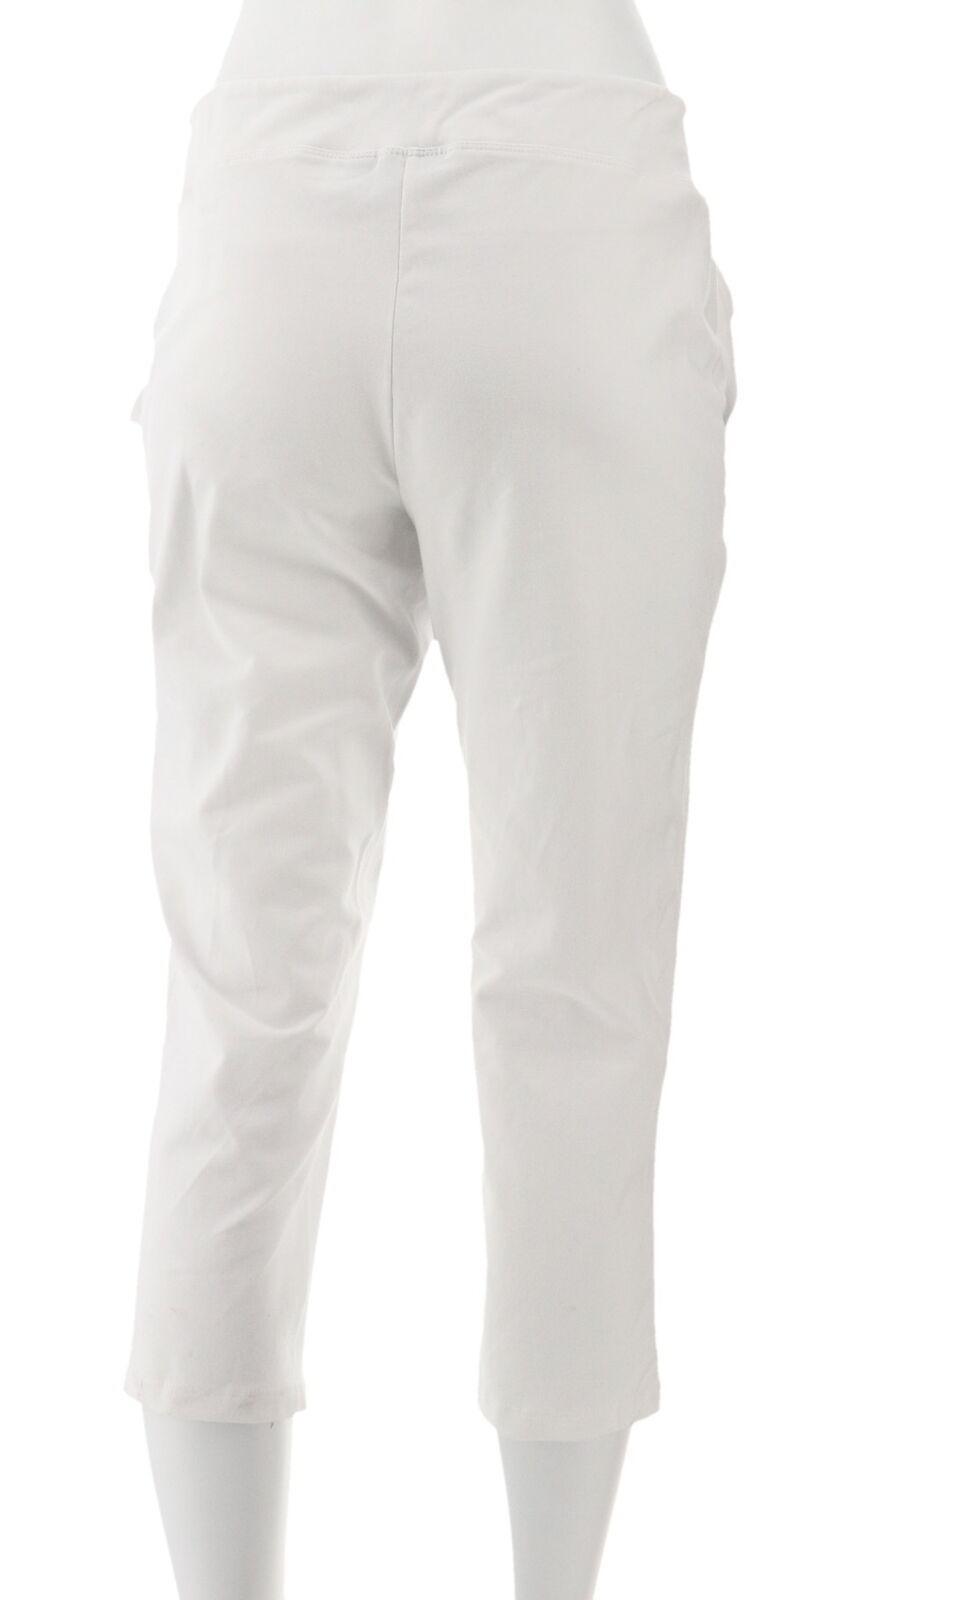 Women with Control Petite Tummy Control Crop Pants White PXXS NEW A292370